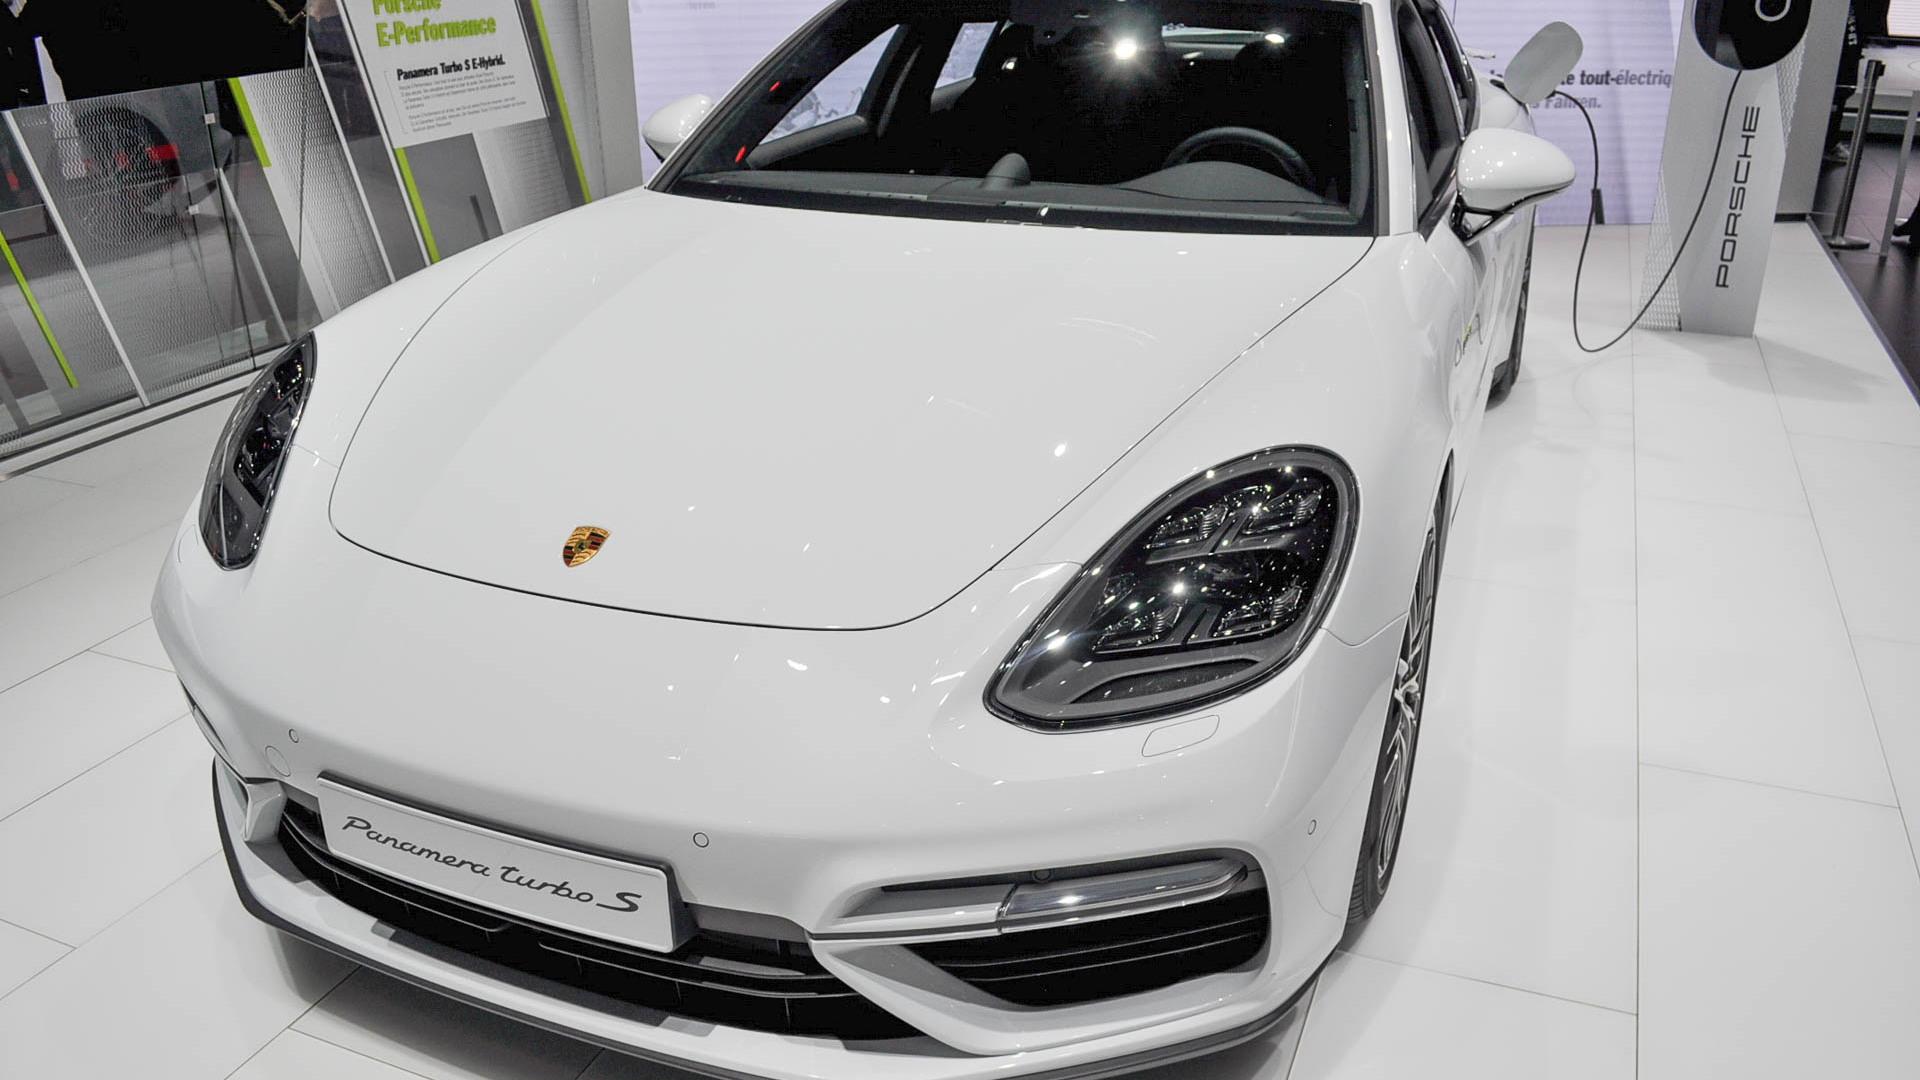 2018 Porsche Panamera Turbo S E-Hybrid, 2017 Geneva auto show